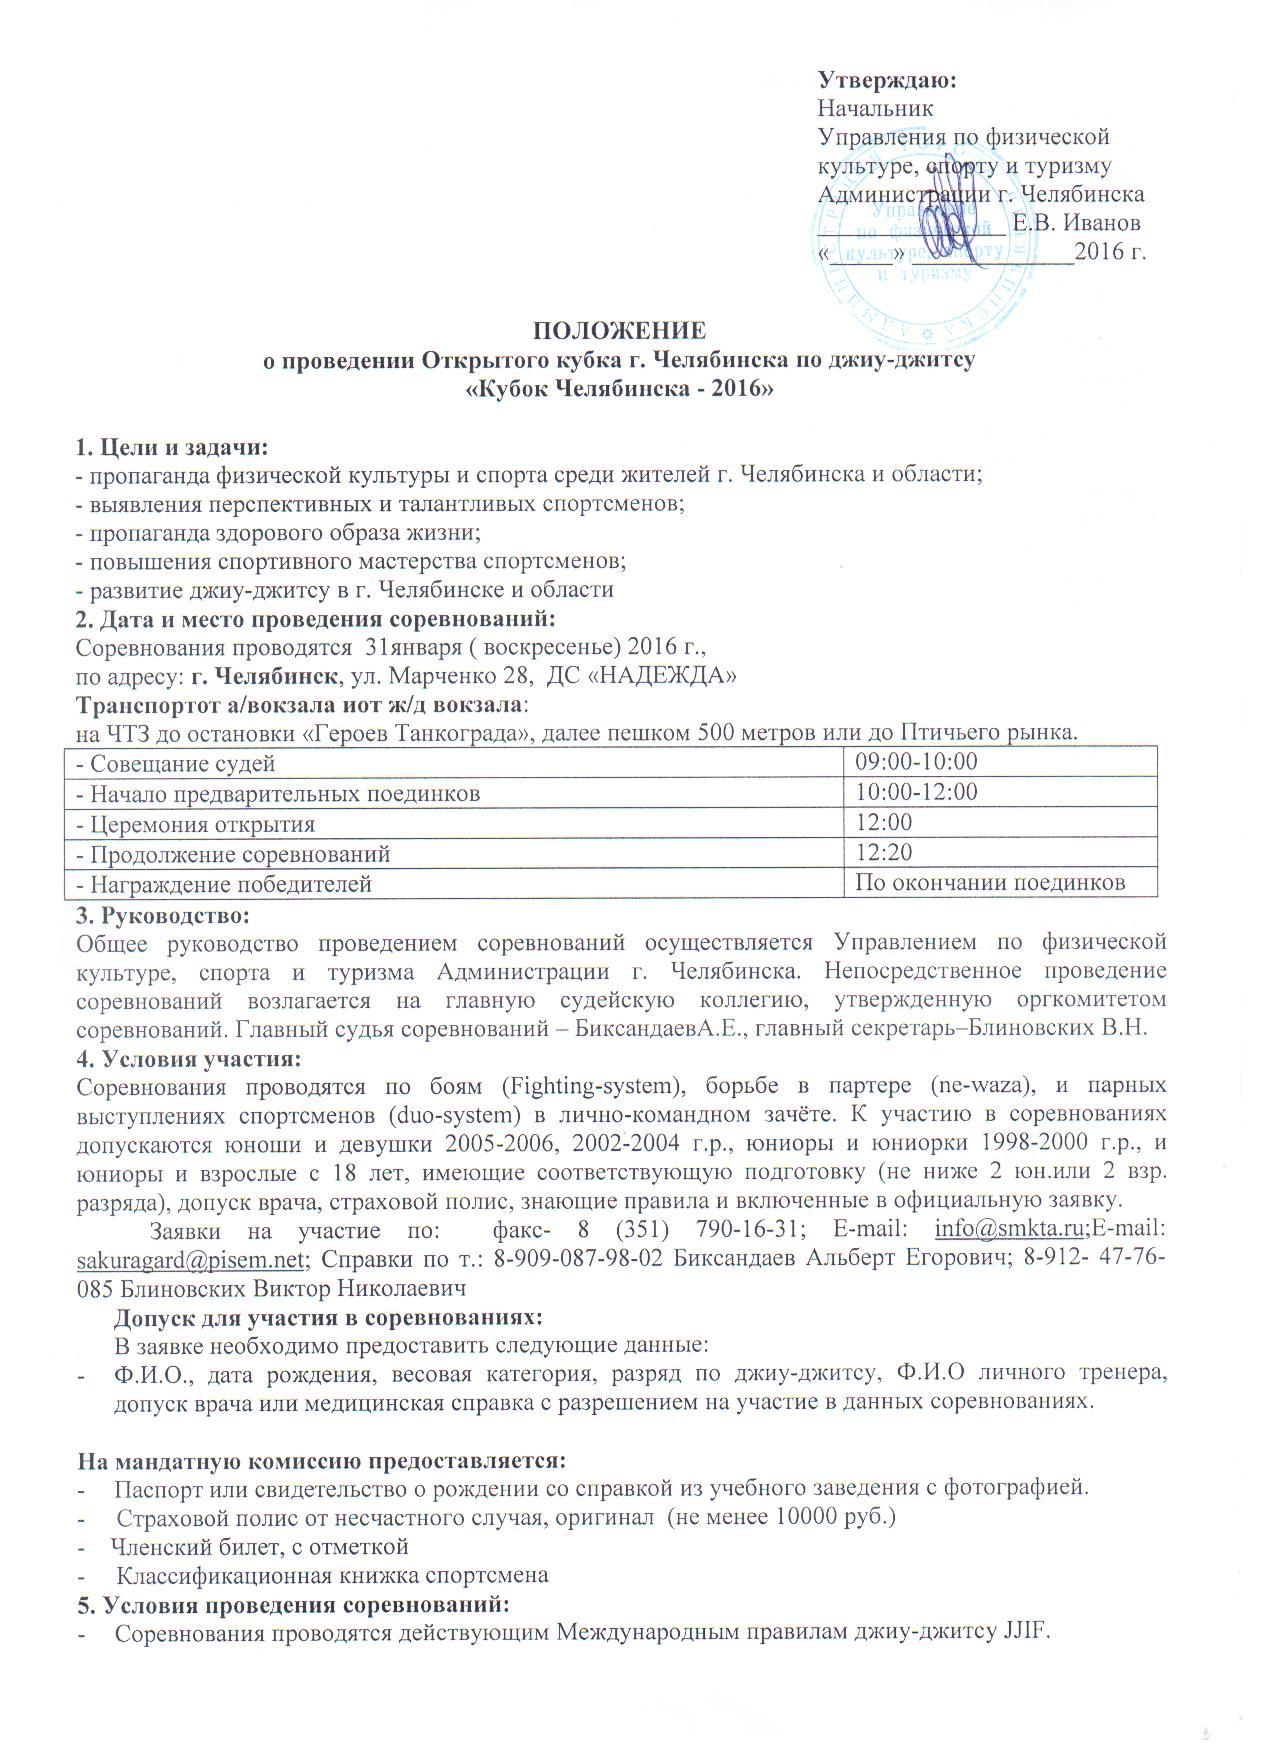 открытый Кубок г. Челябинск 31.01.16г.jpg